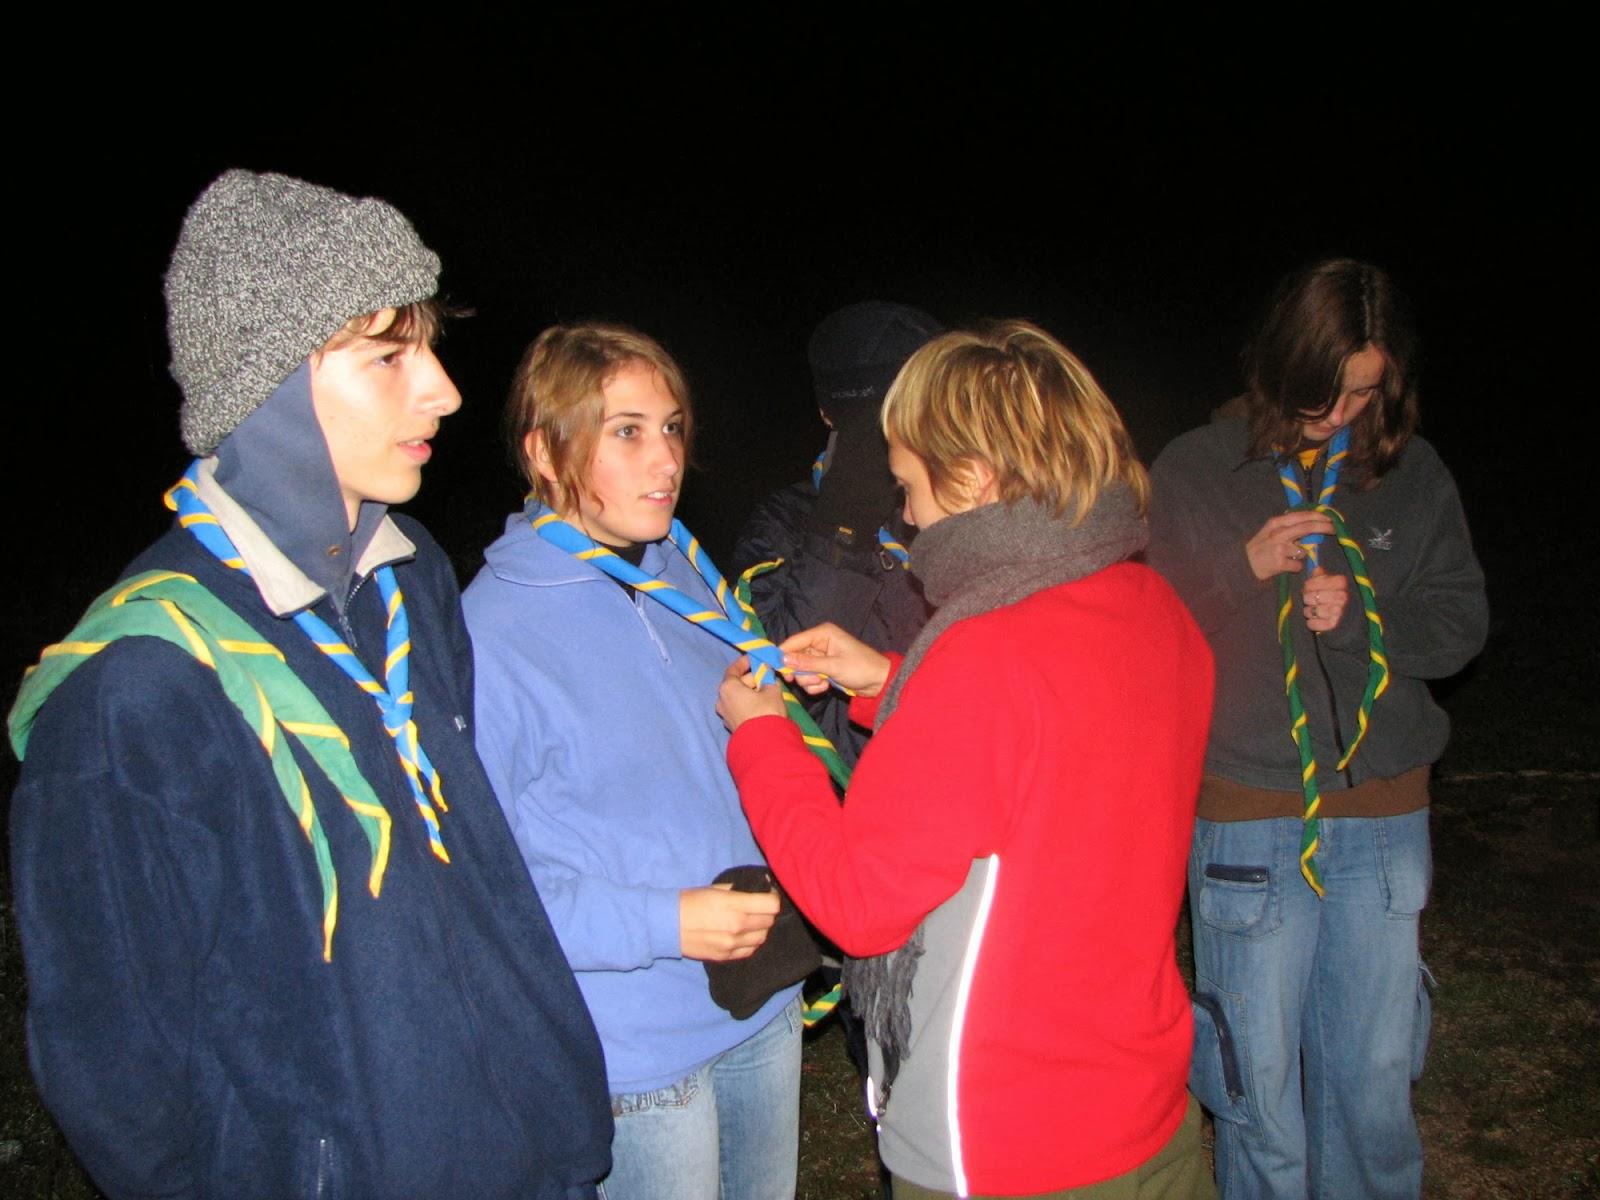 Prehod PP, Ilirska Bistrica 2005 - picture%2B089.jpg